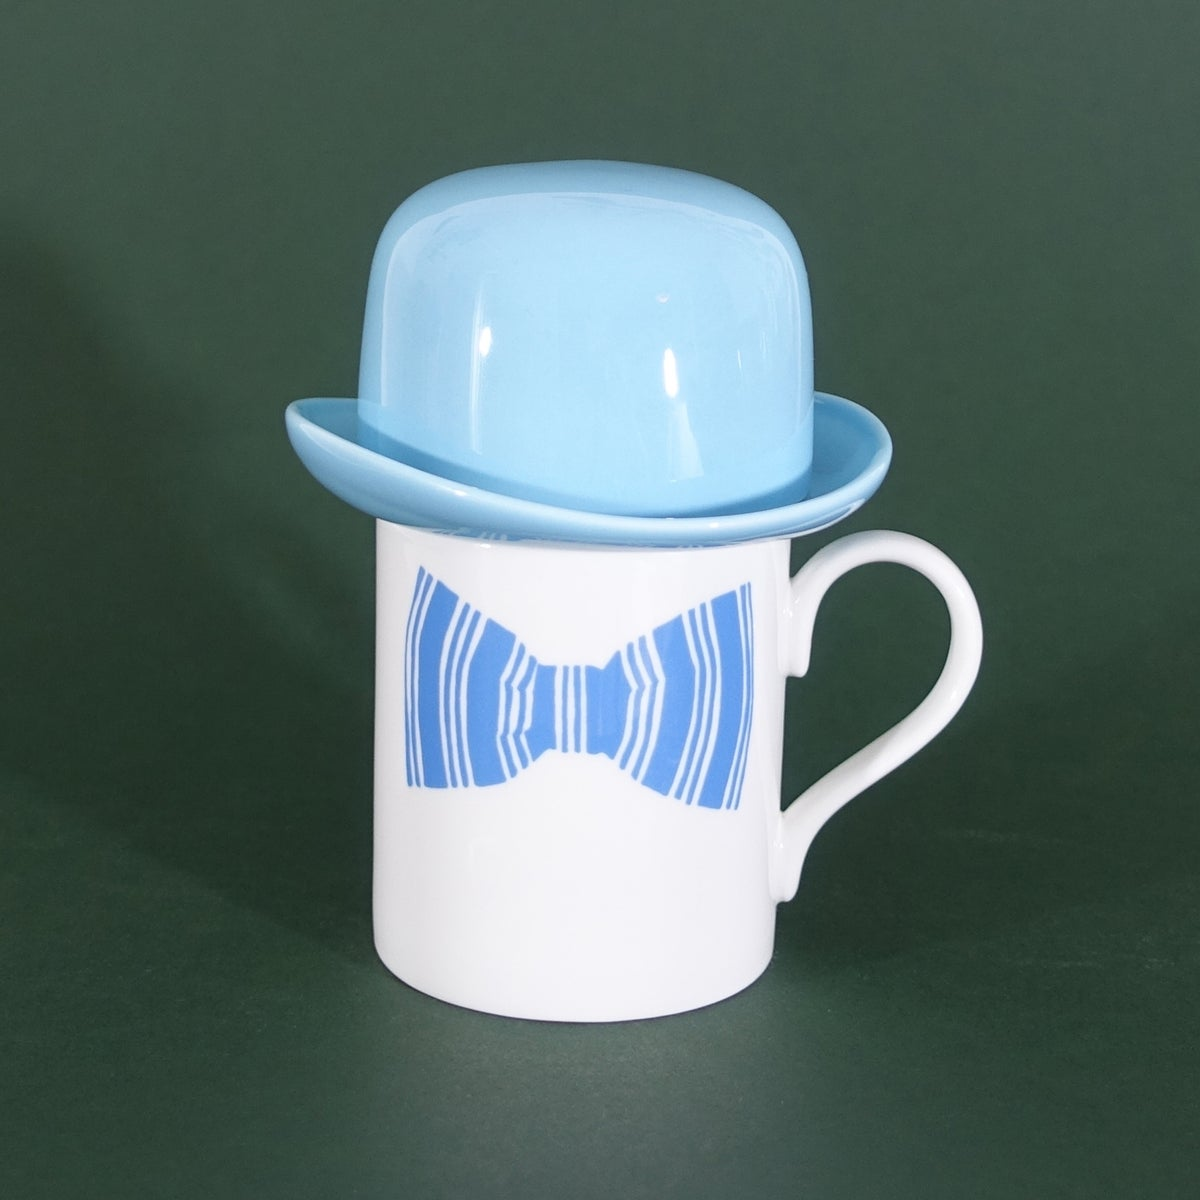 Image of Blue Bow Tie Mug & matching Thomson & Thompson Bowler Hat Sugar Bowl Set